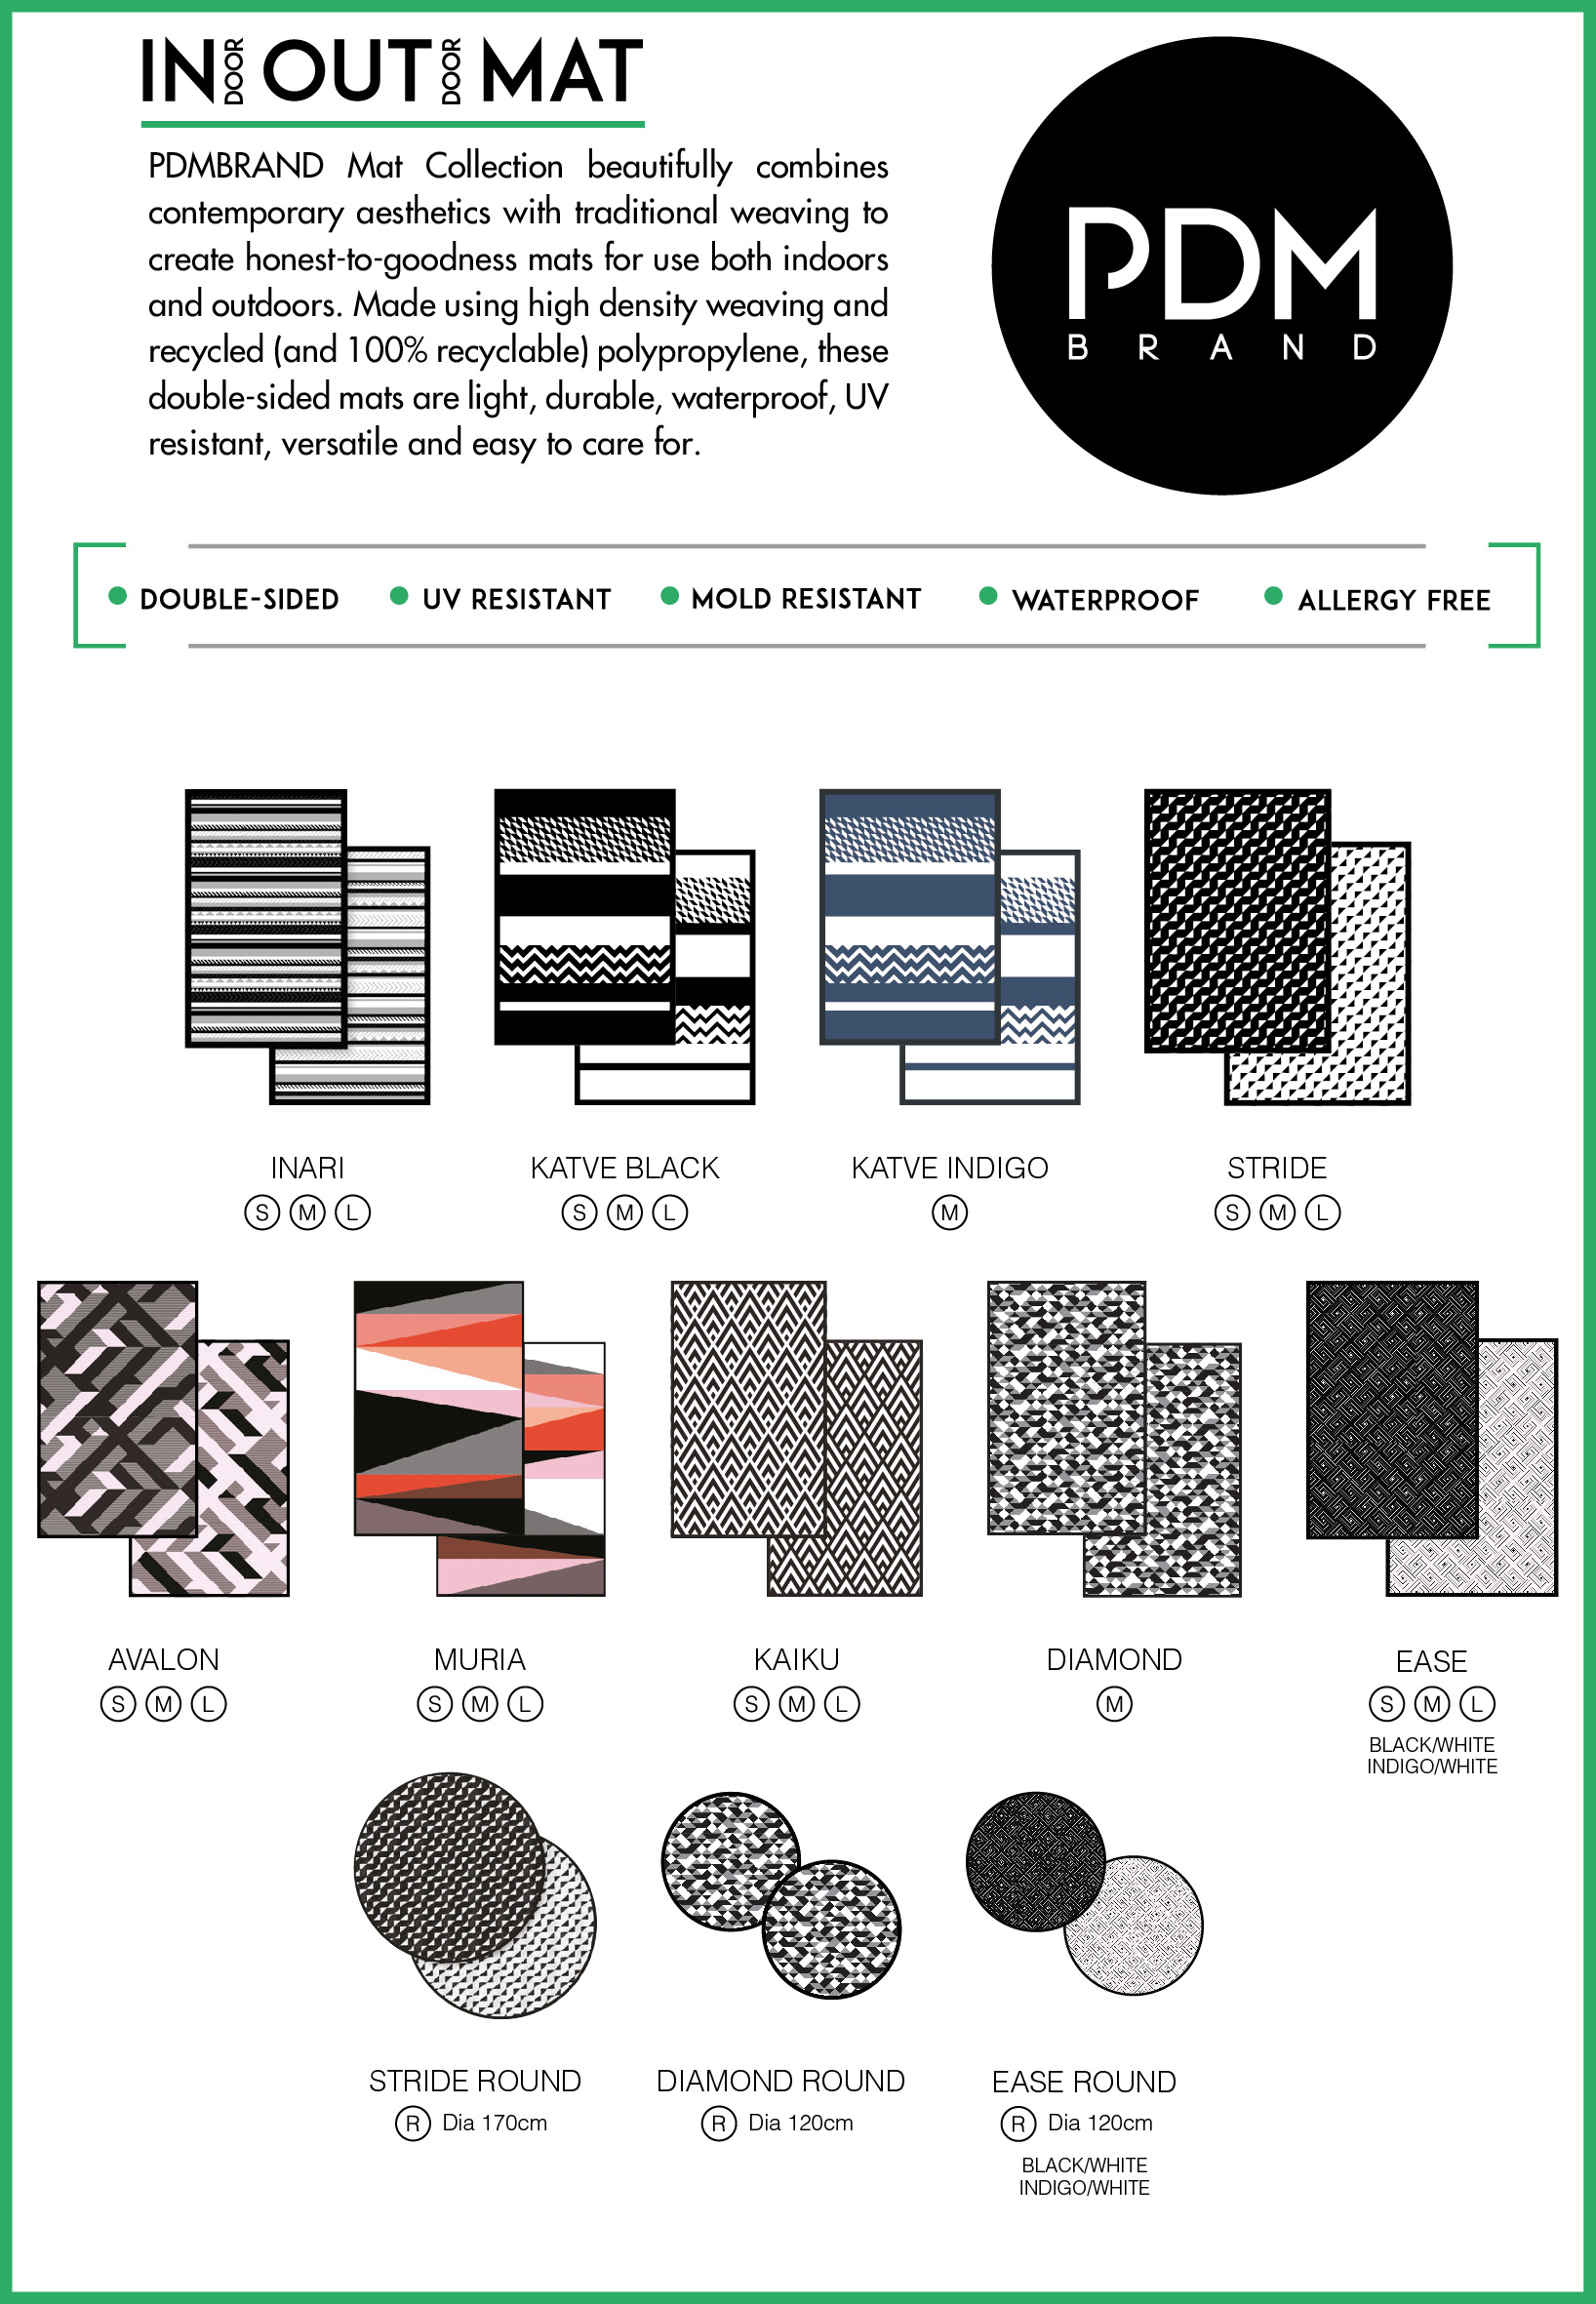 PDM Brand Designs (June 2019).jpg